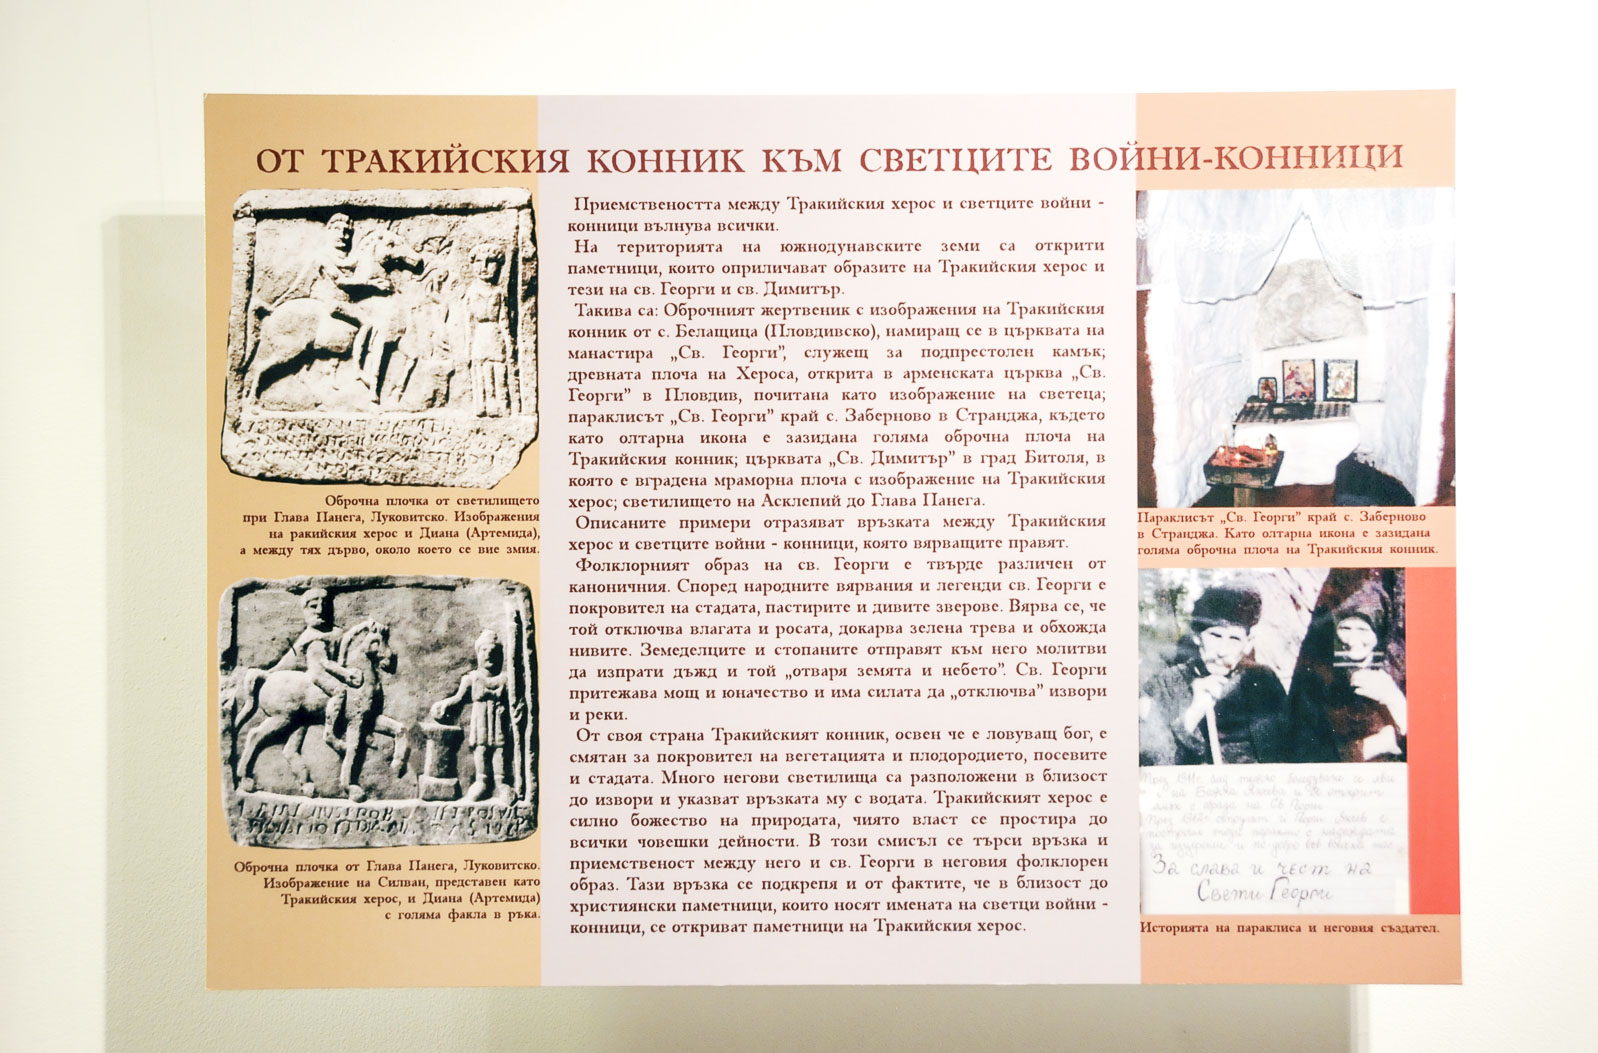 troyan-museum-jivotat-na-edna-idea-36